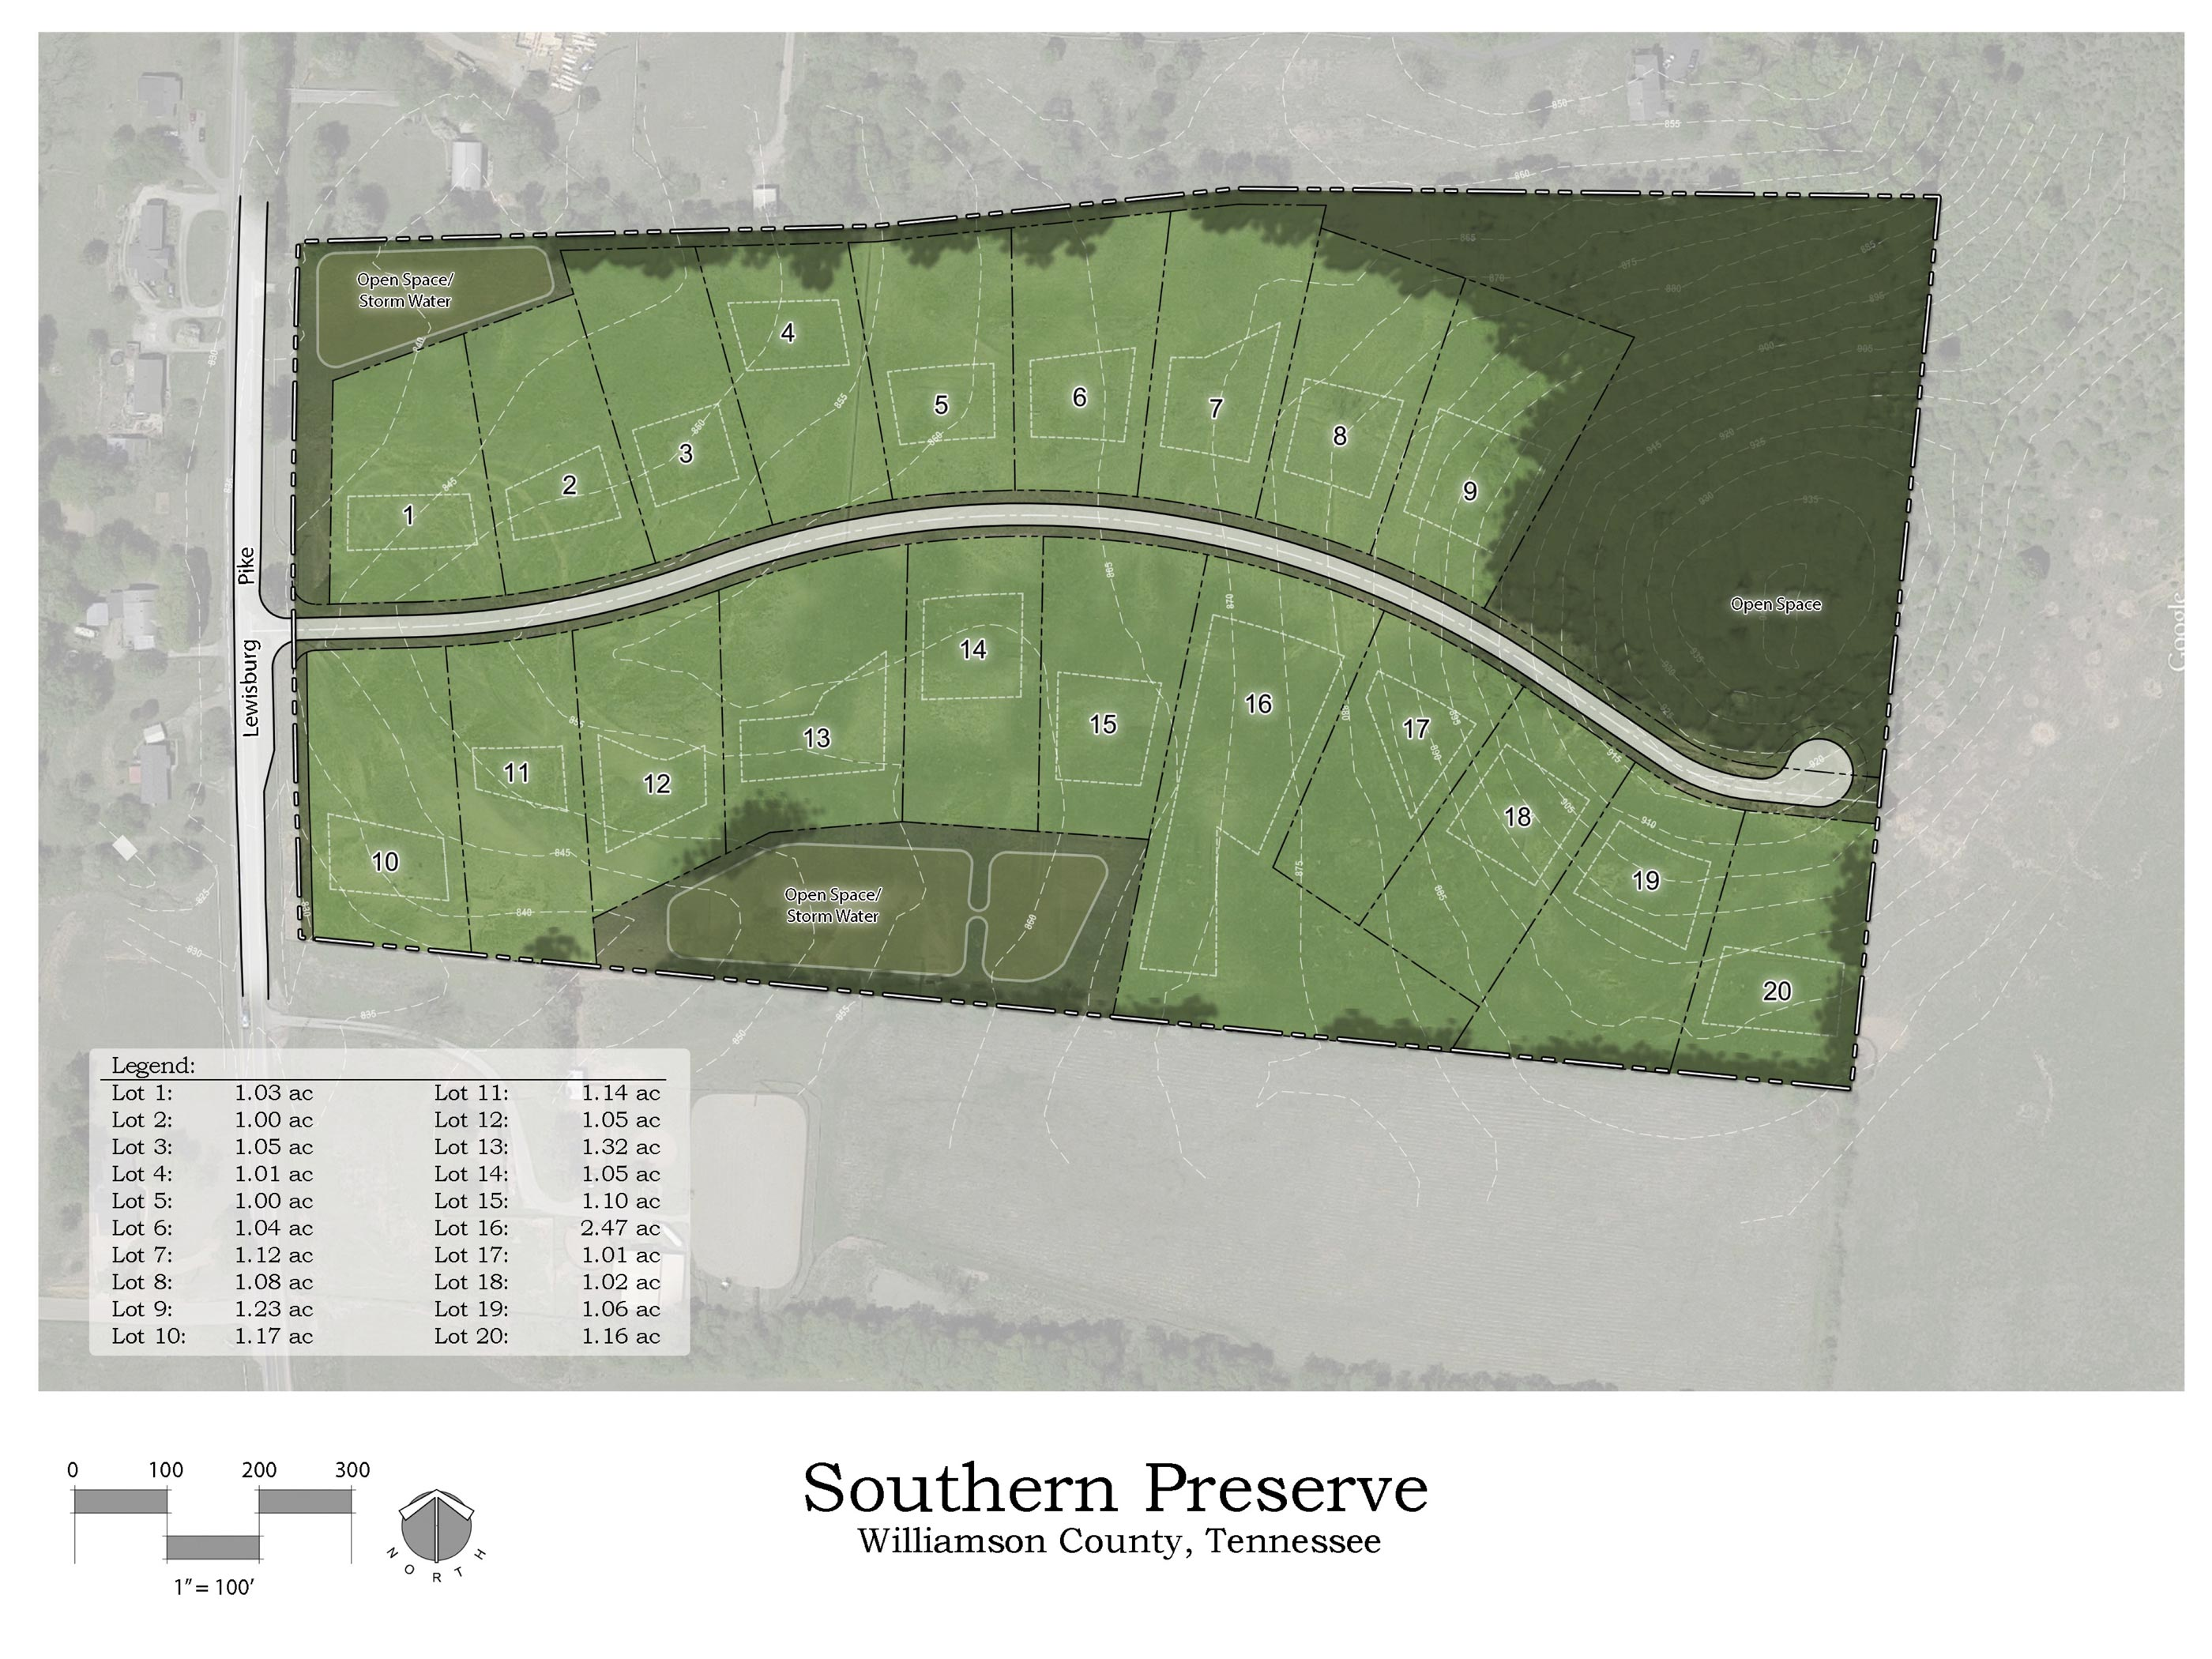 Site rendering of Southern Preserve by Jason Goddard